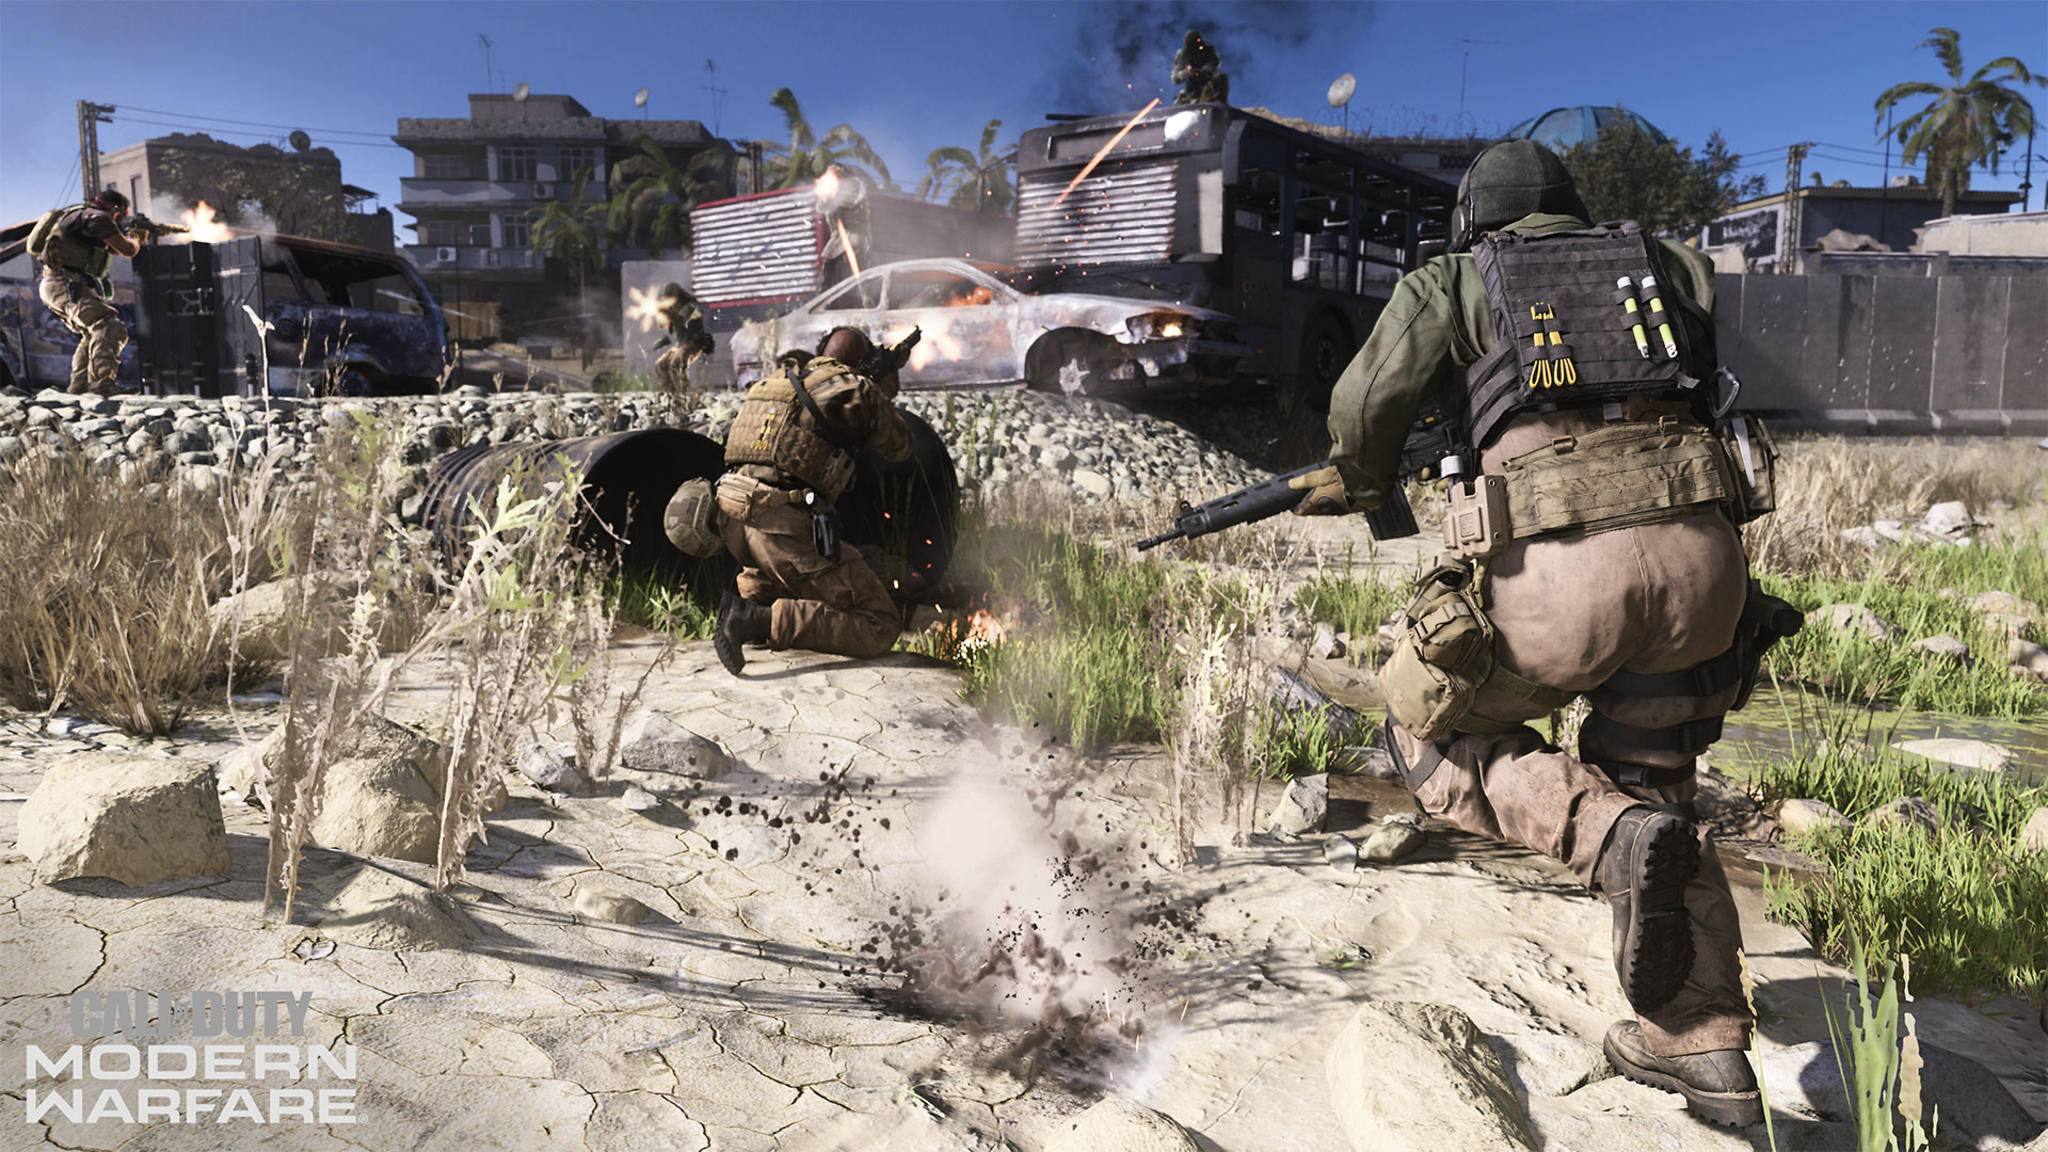 call-of-duty-modern-warfare-multiplayer-screenshot-02